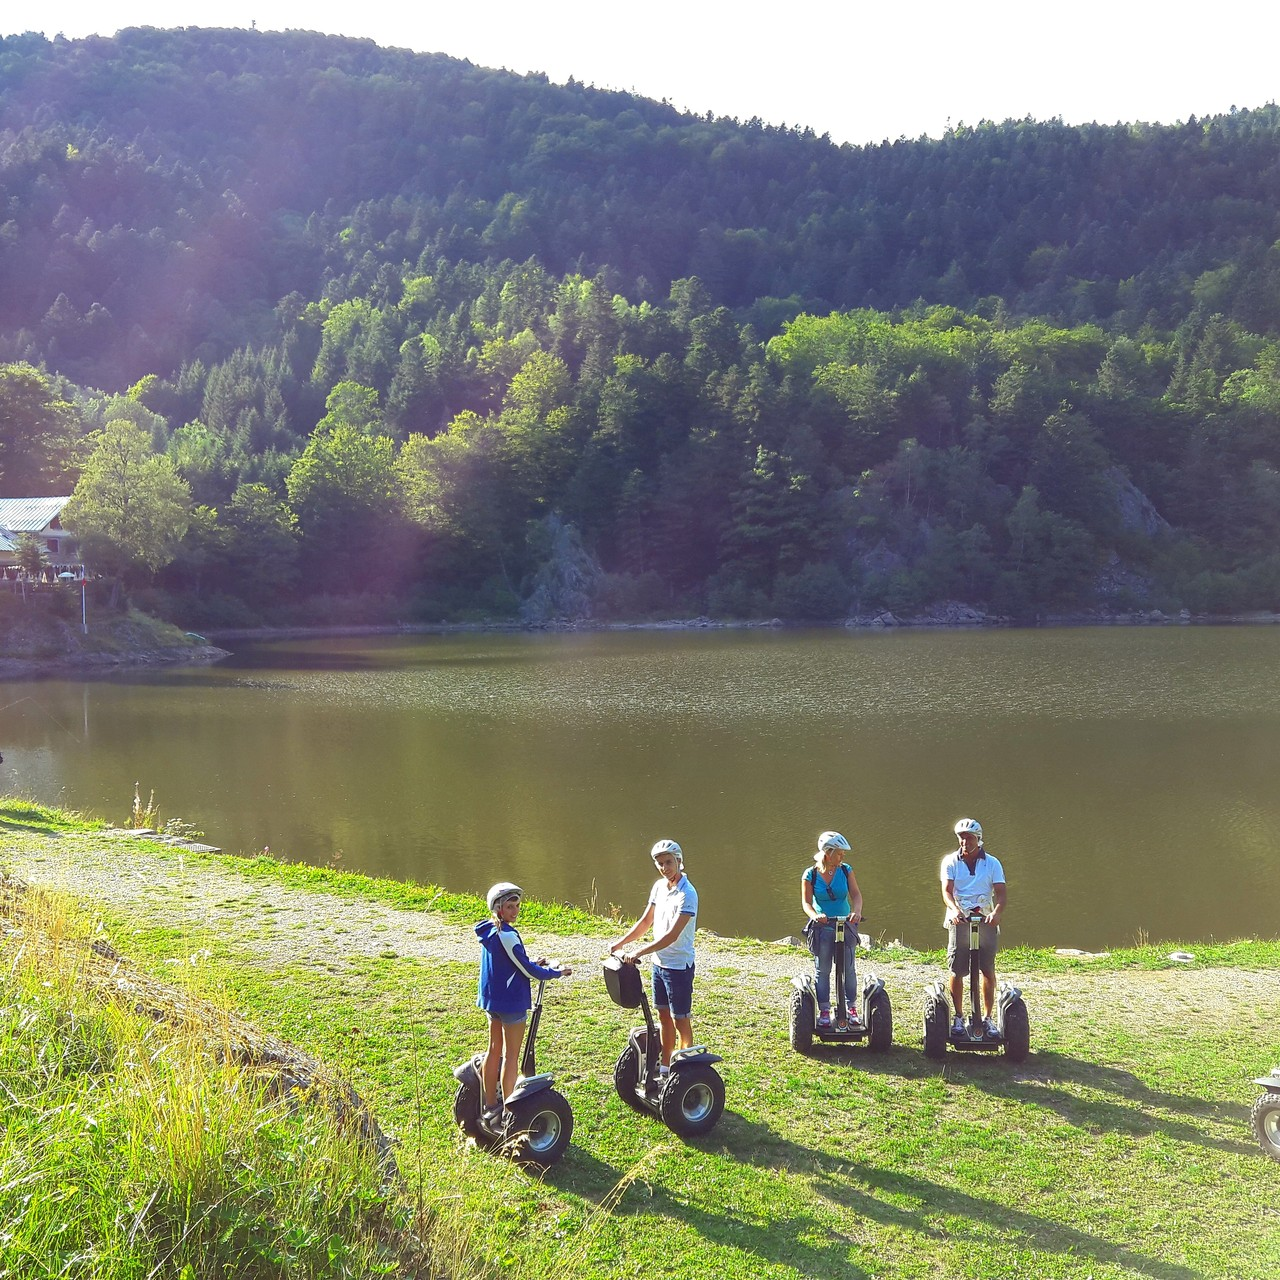 FUN MOVING GYROPODE SEGWAY EN ALSACE - Lac Grand Neuweiher, Vosges